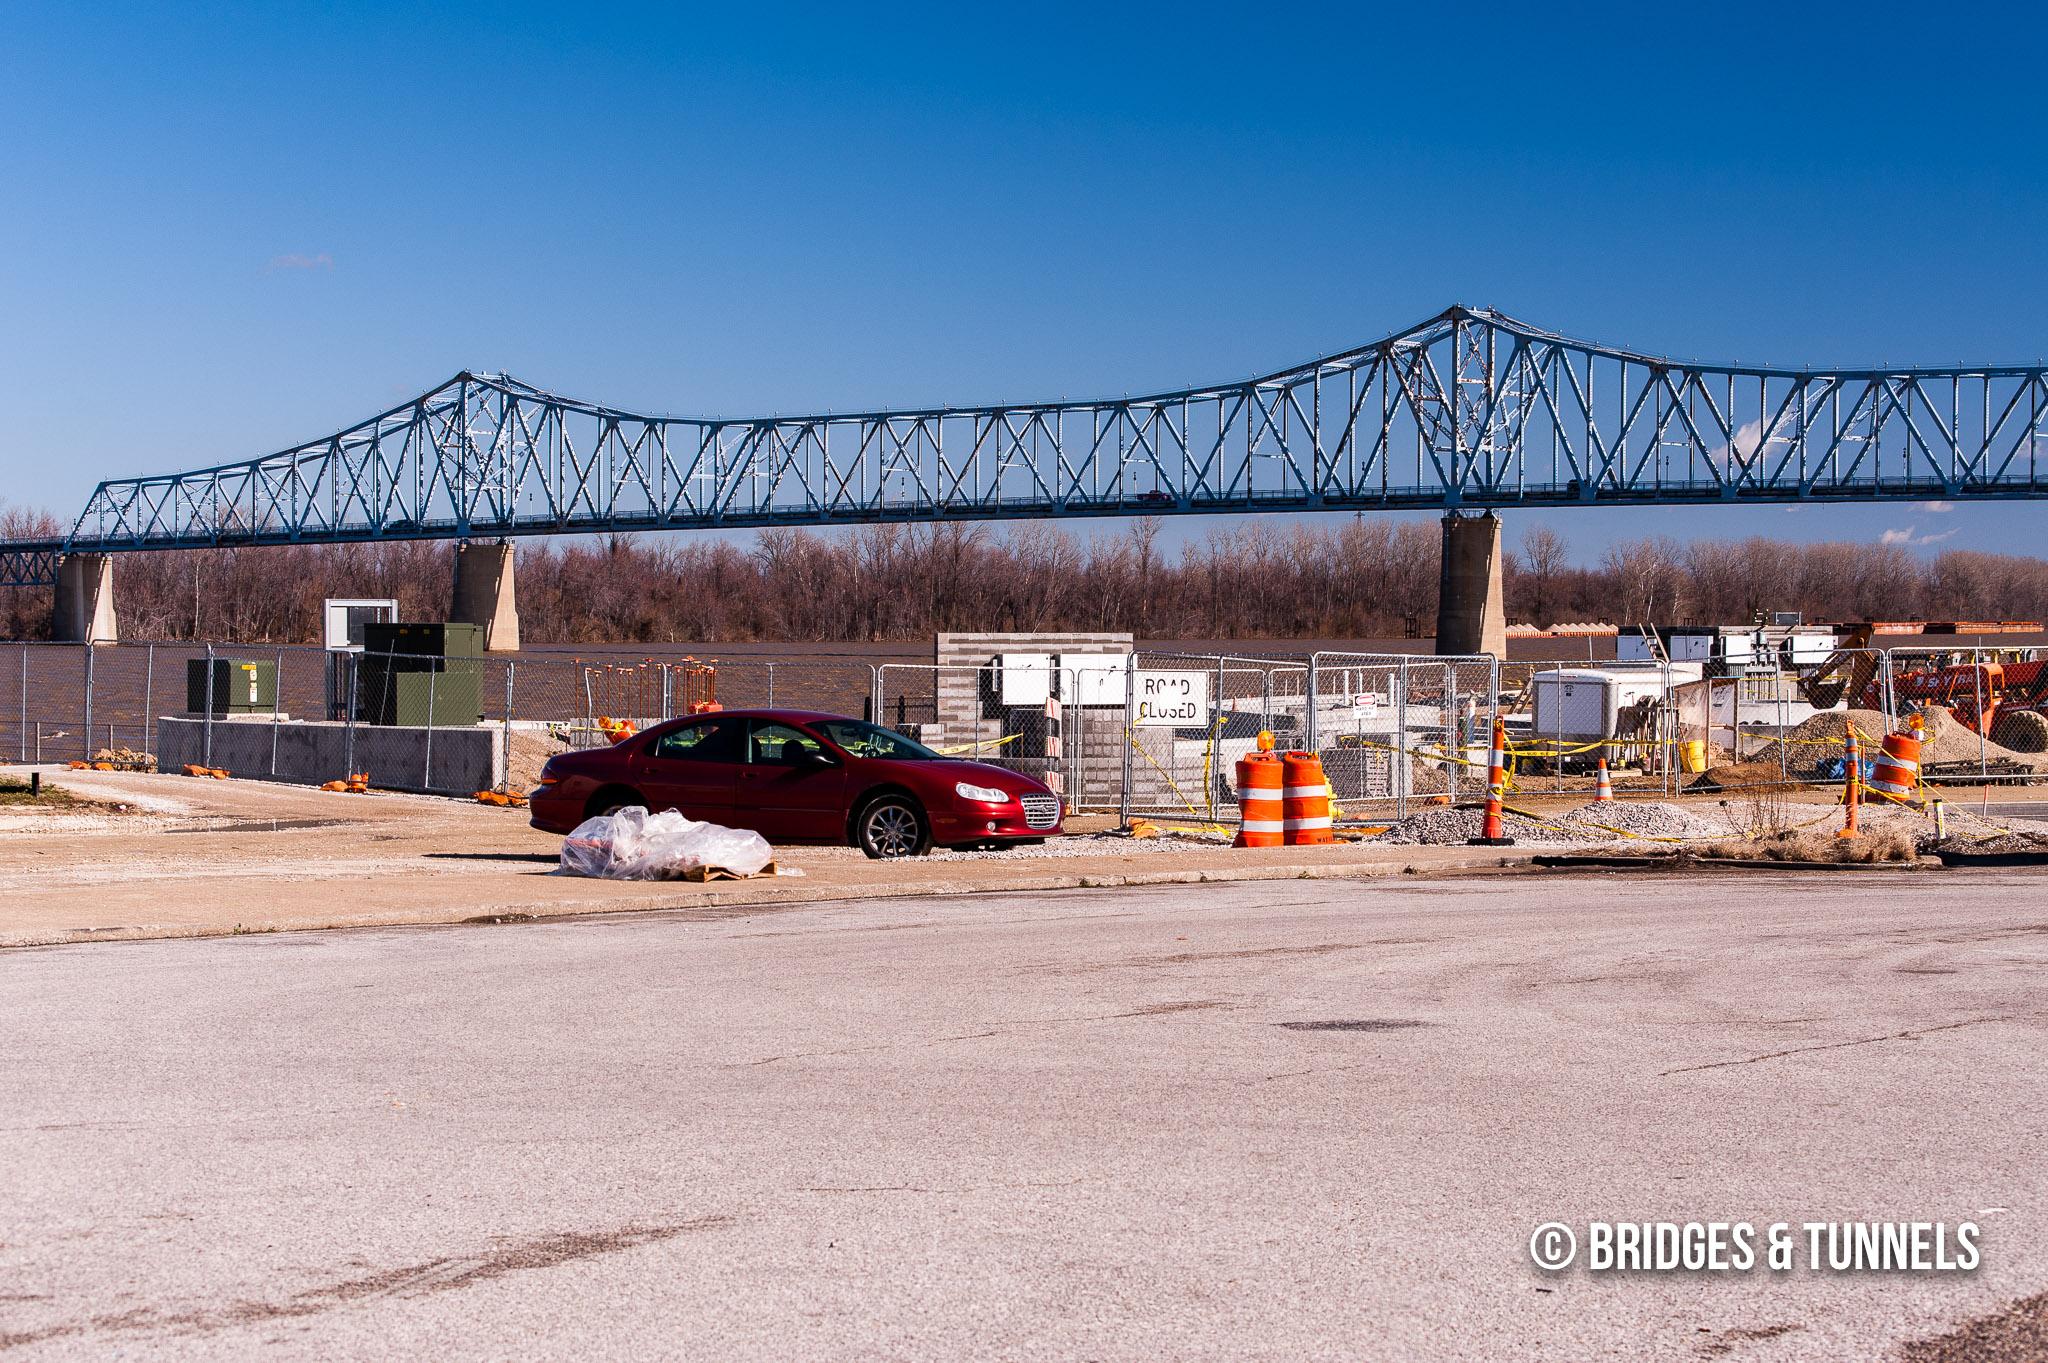 Owensboro Bridge